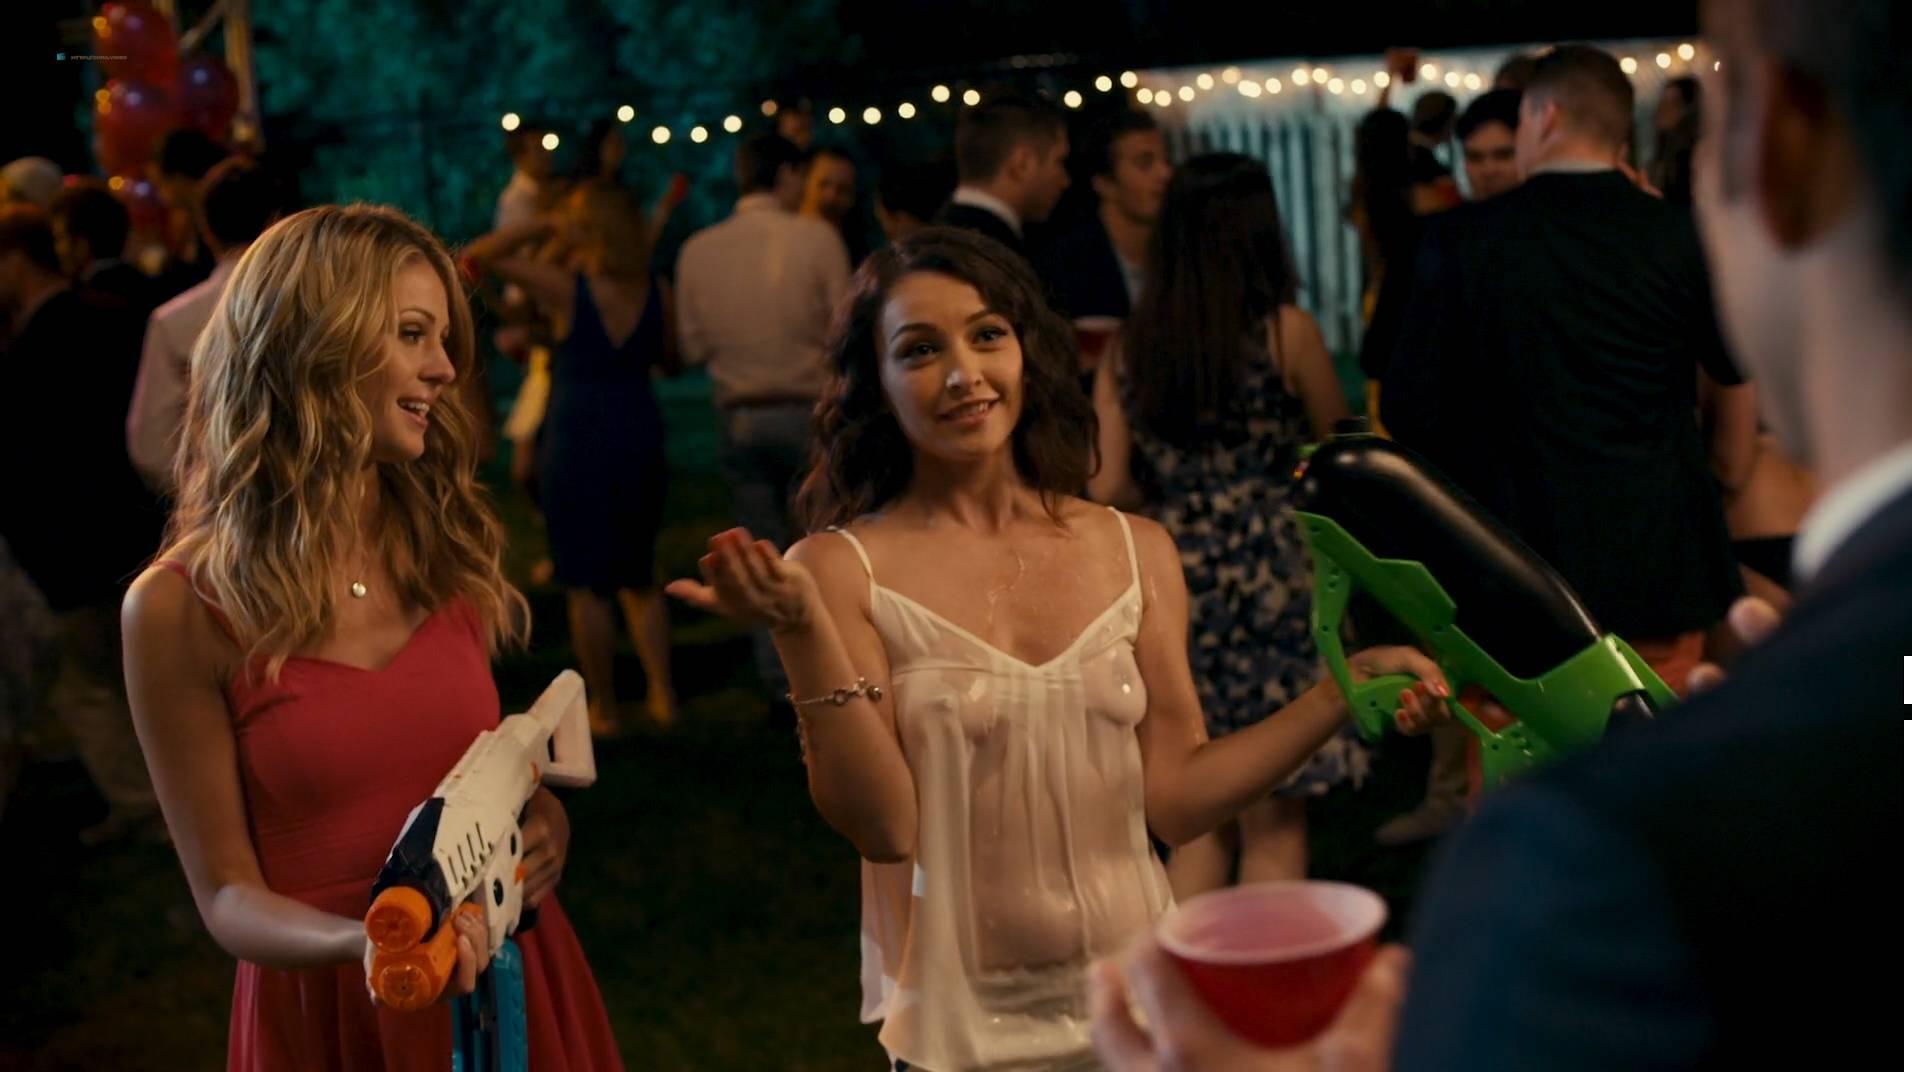 Jennifer Krukowski nude topless Aubrey Ferron and others all nude - Total Frat Movie (2016.) HD 1080p WEB (18)